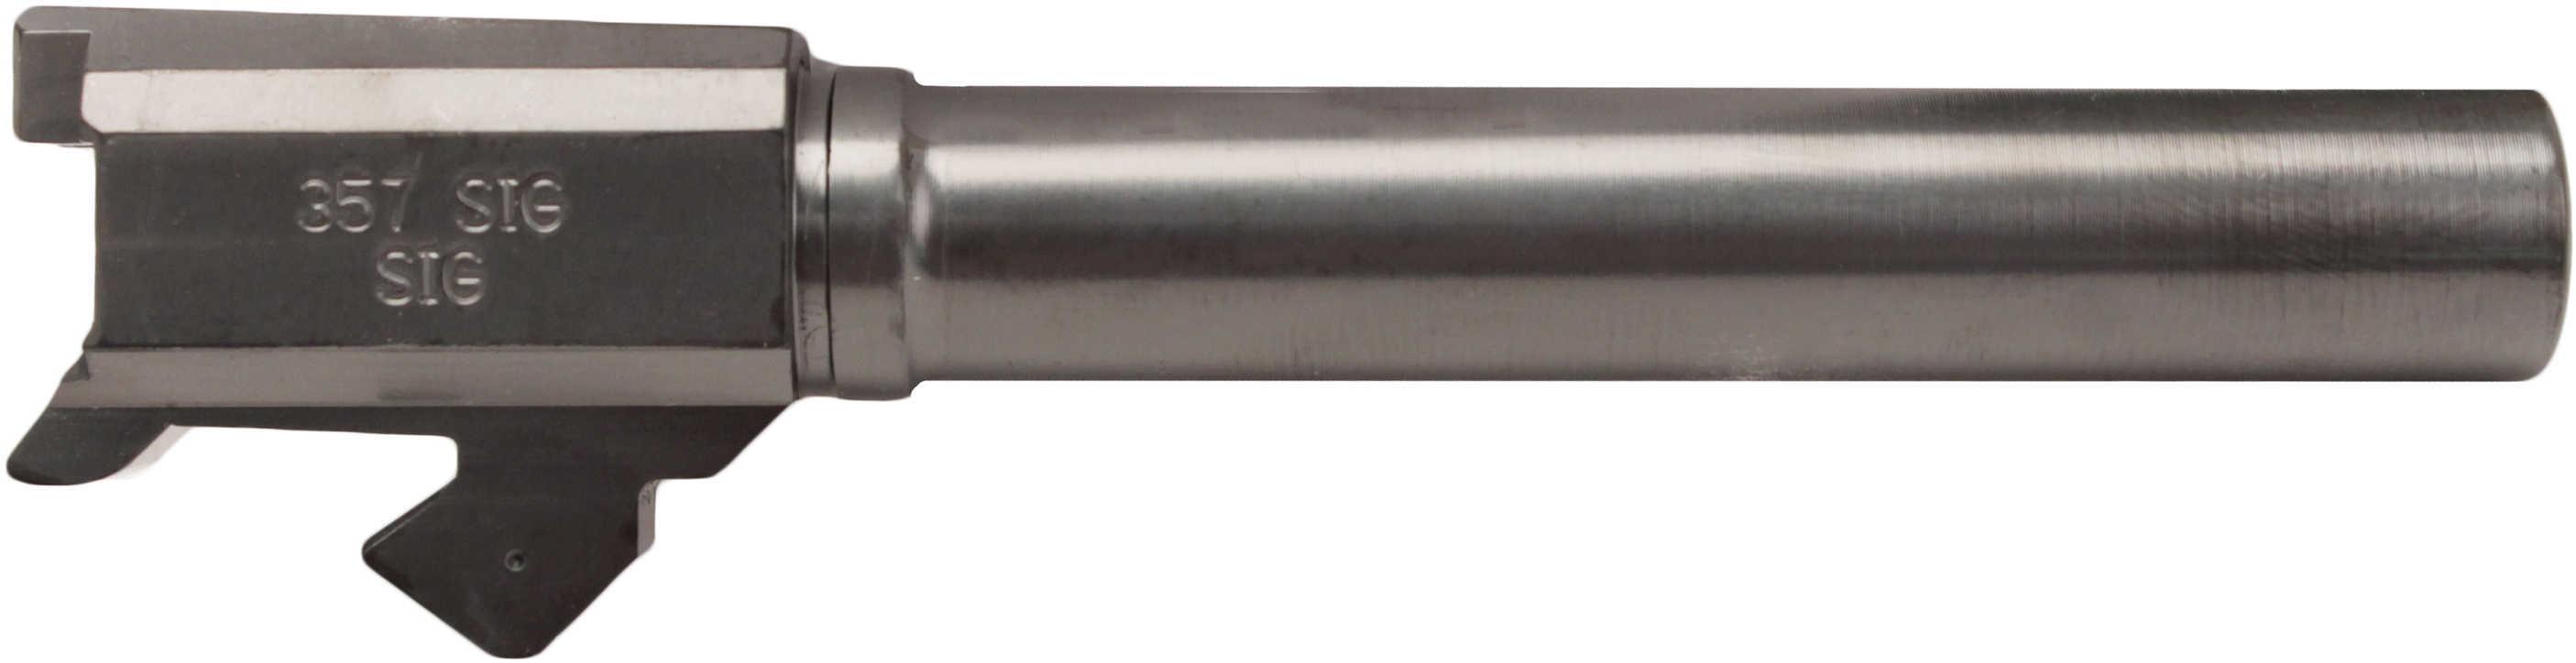 Sig Barrel P226 357Sig BROACHED